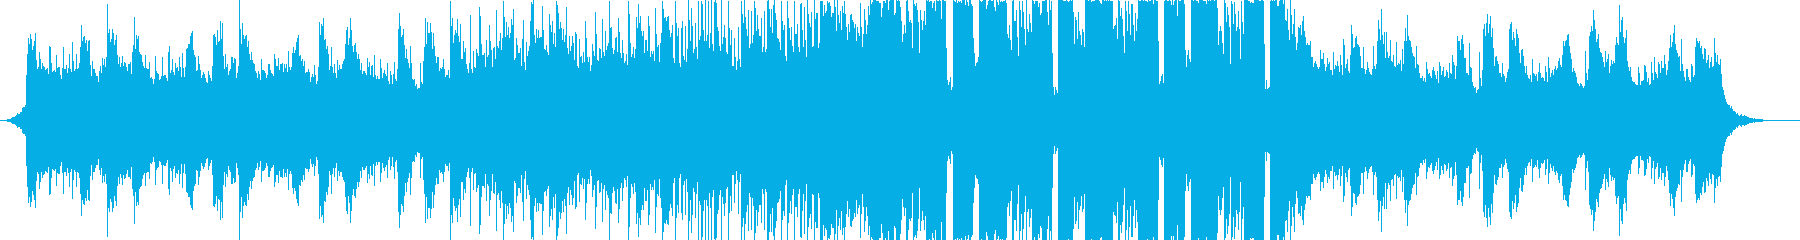 FutureBass2、洋楽、爽快、夏bの再生済みの波形